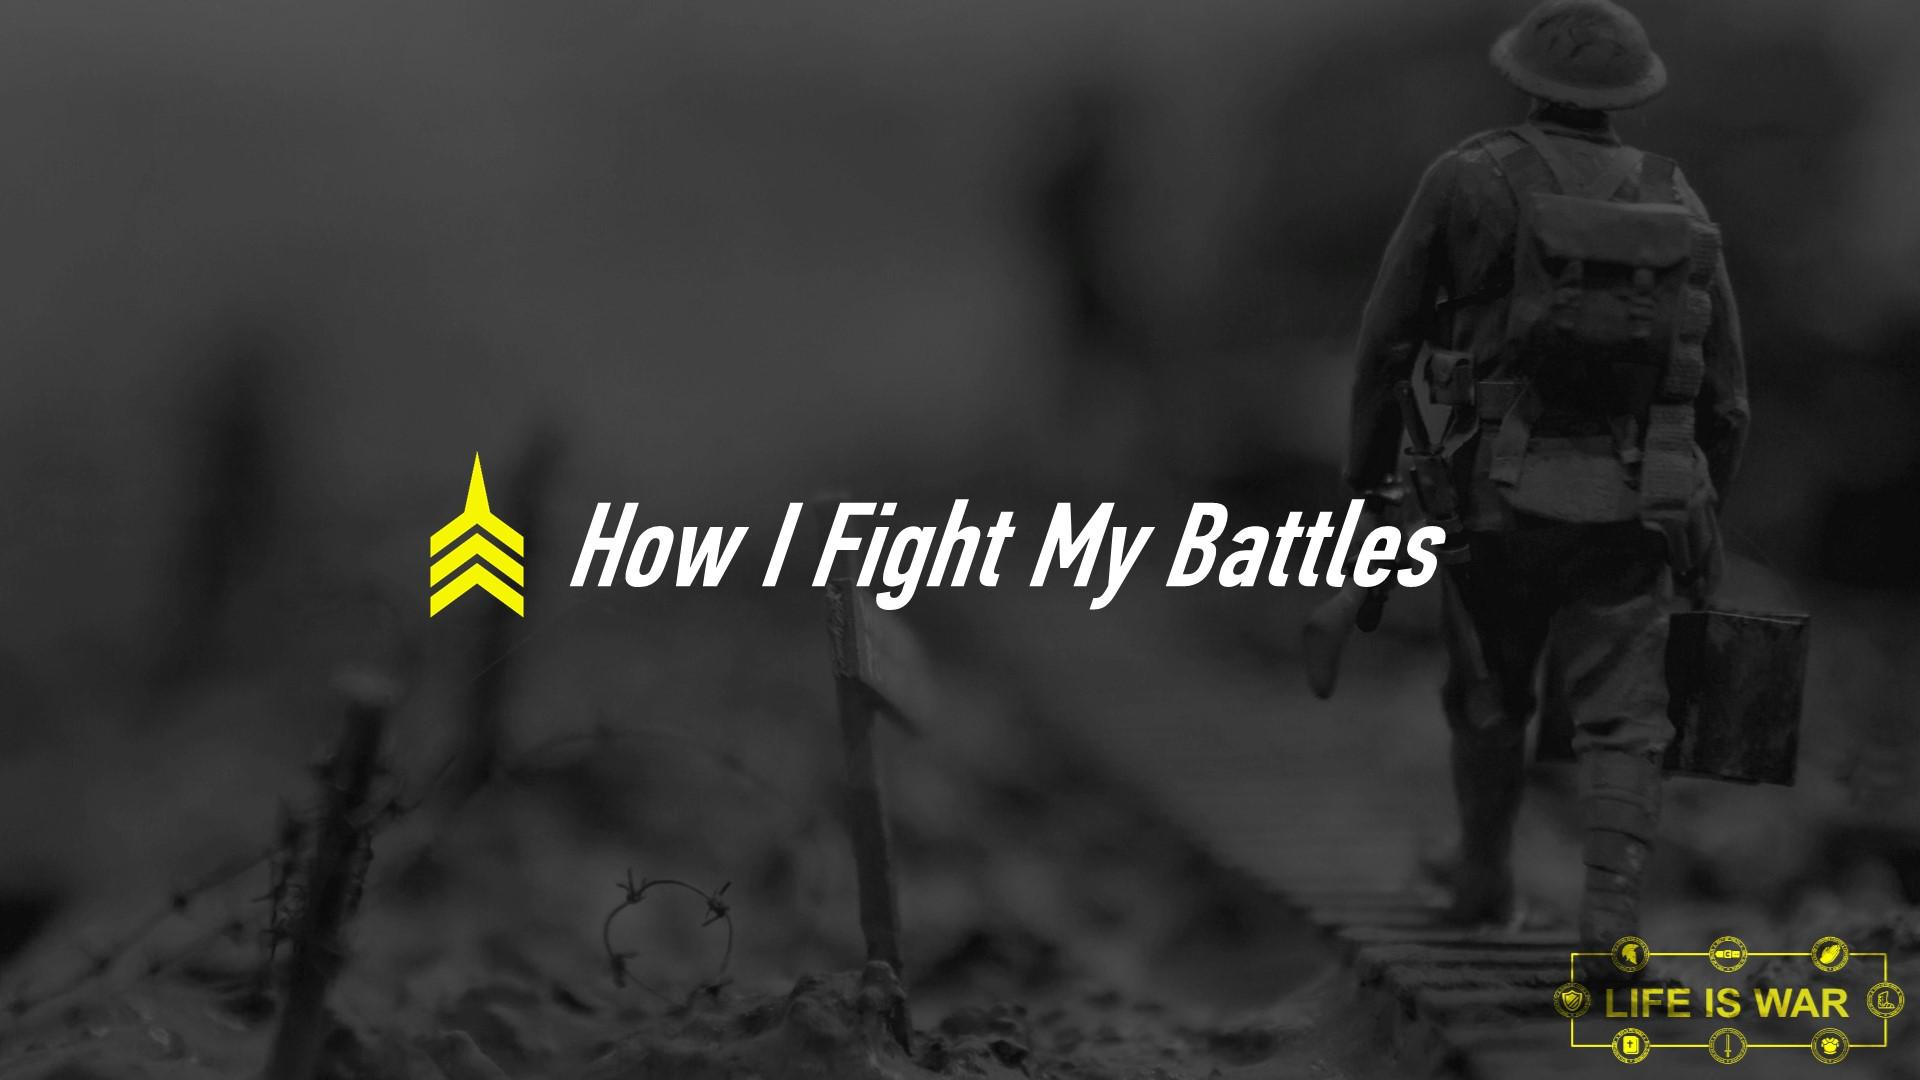 20180826 How I Fight My Battles.JPG